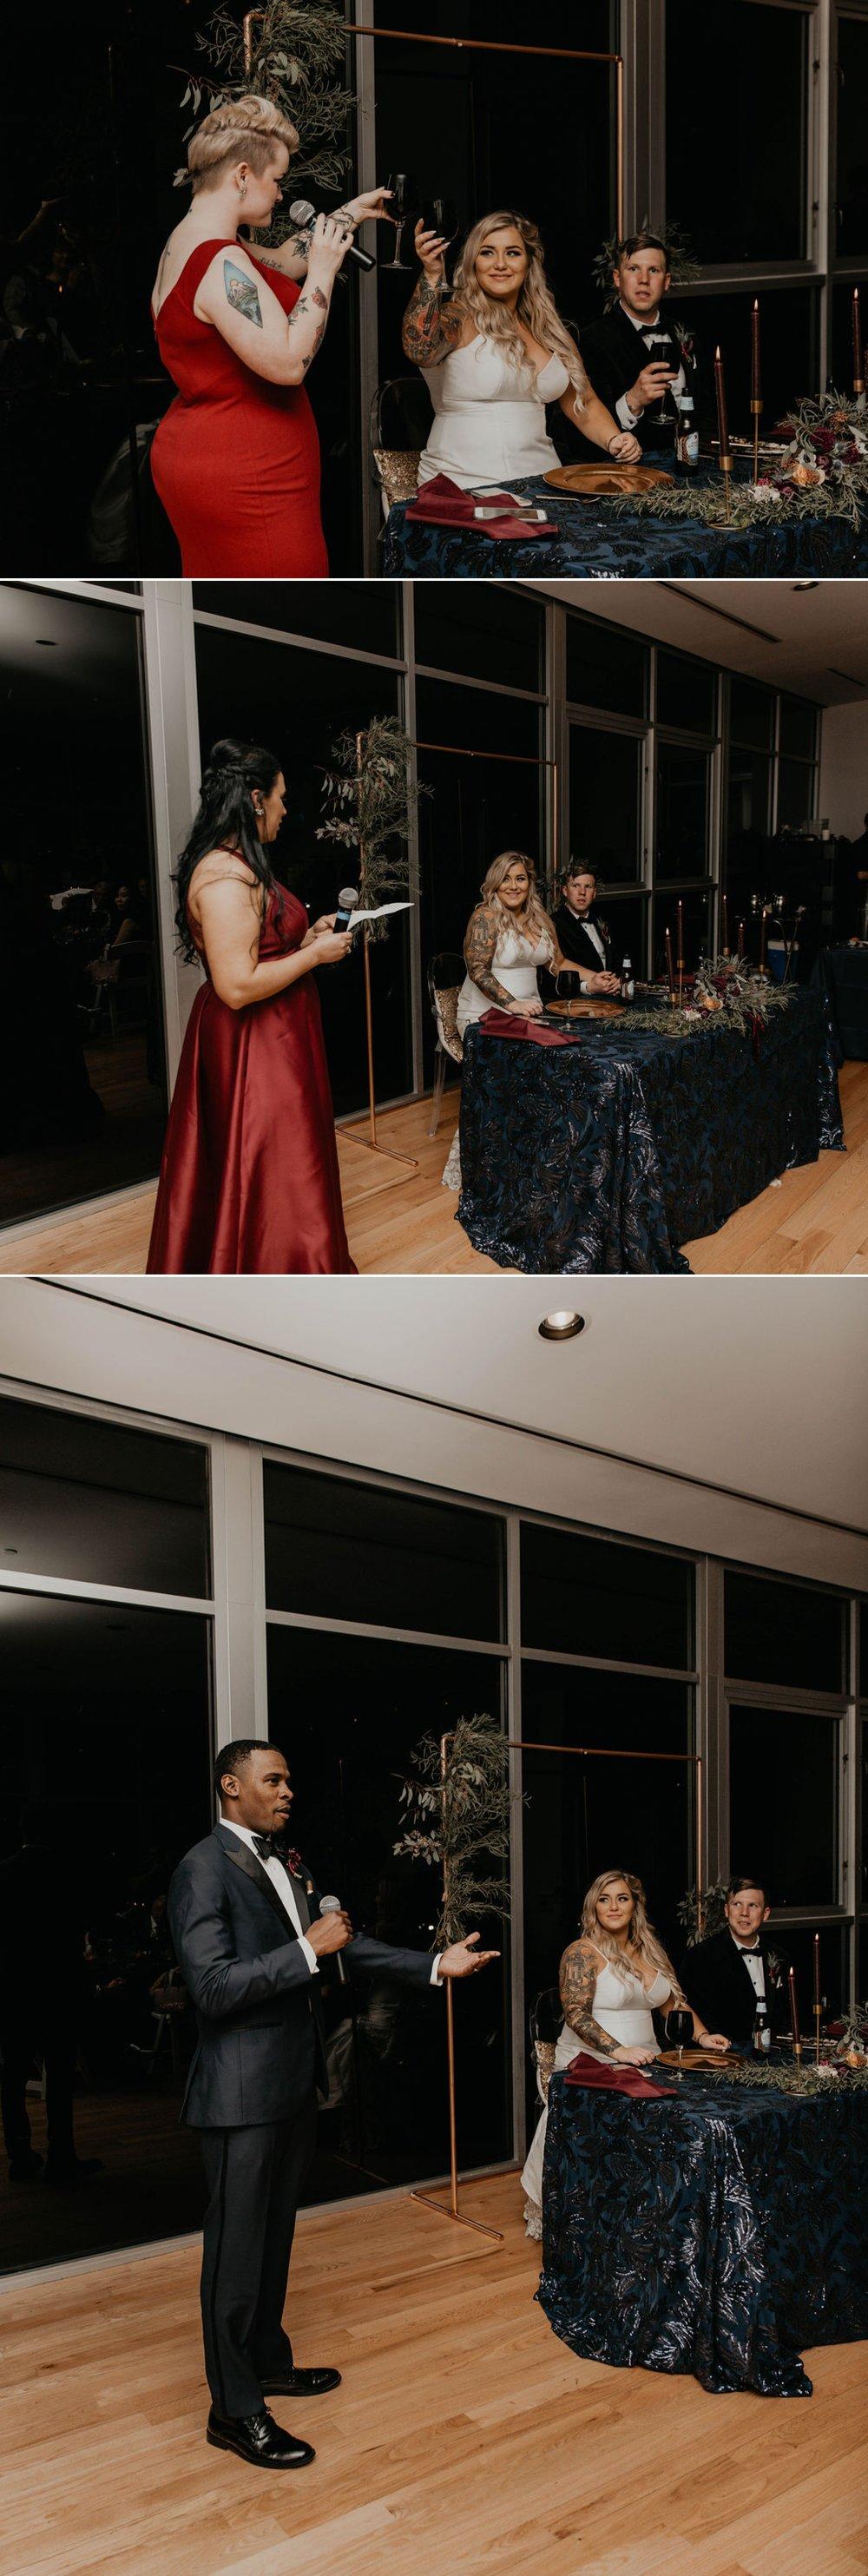 Toasts -  Matt Smarsh and Johanna Dye - suites by the black tux - Raleigh North Carolina Urban Downtown Wedding